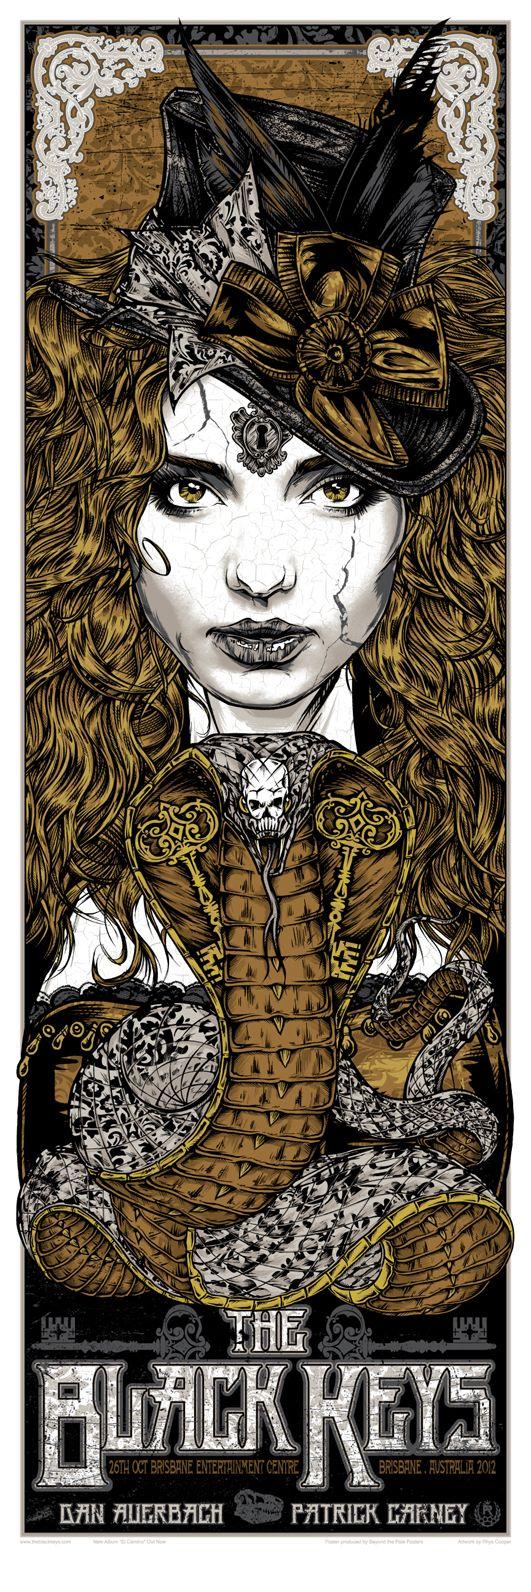 INSIDE THE ROCK POSTER FRAME BLOG: Rhys Cooper The Black Keys Variant Posters On Sale NOW